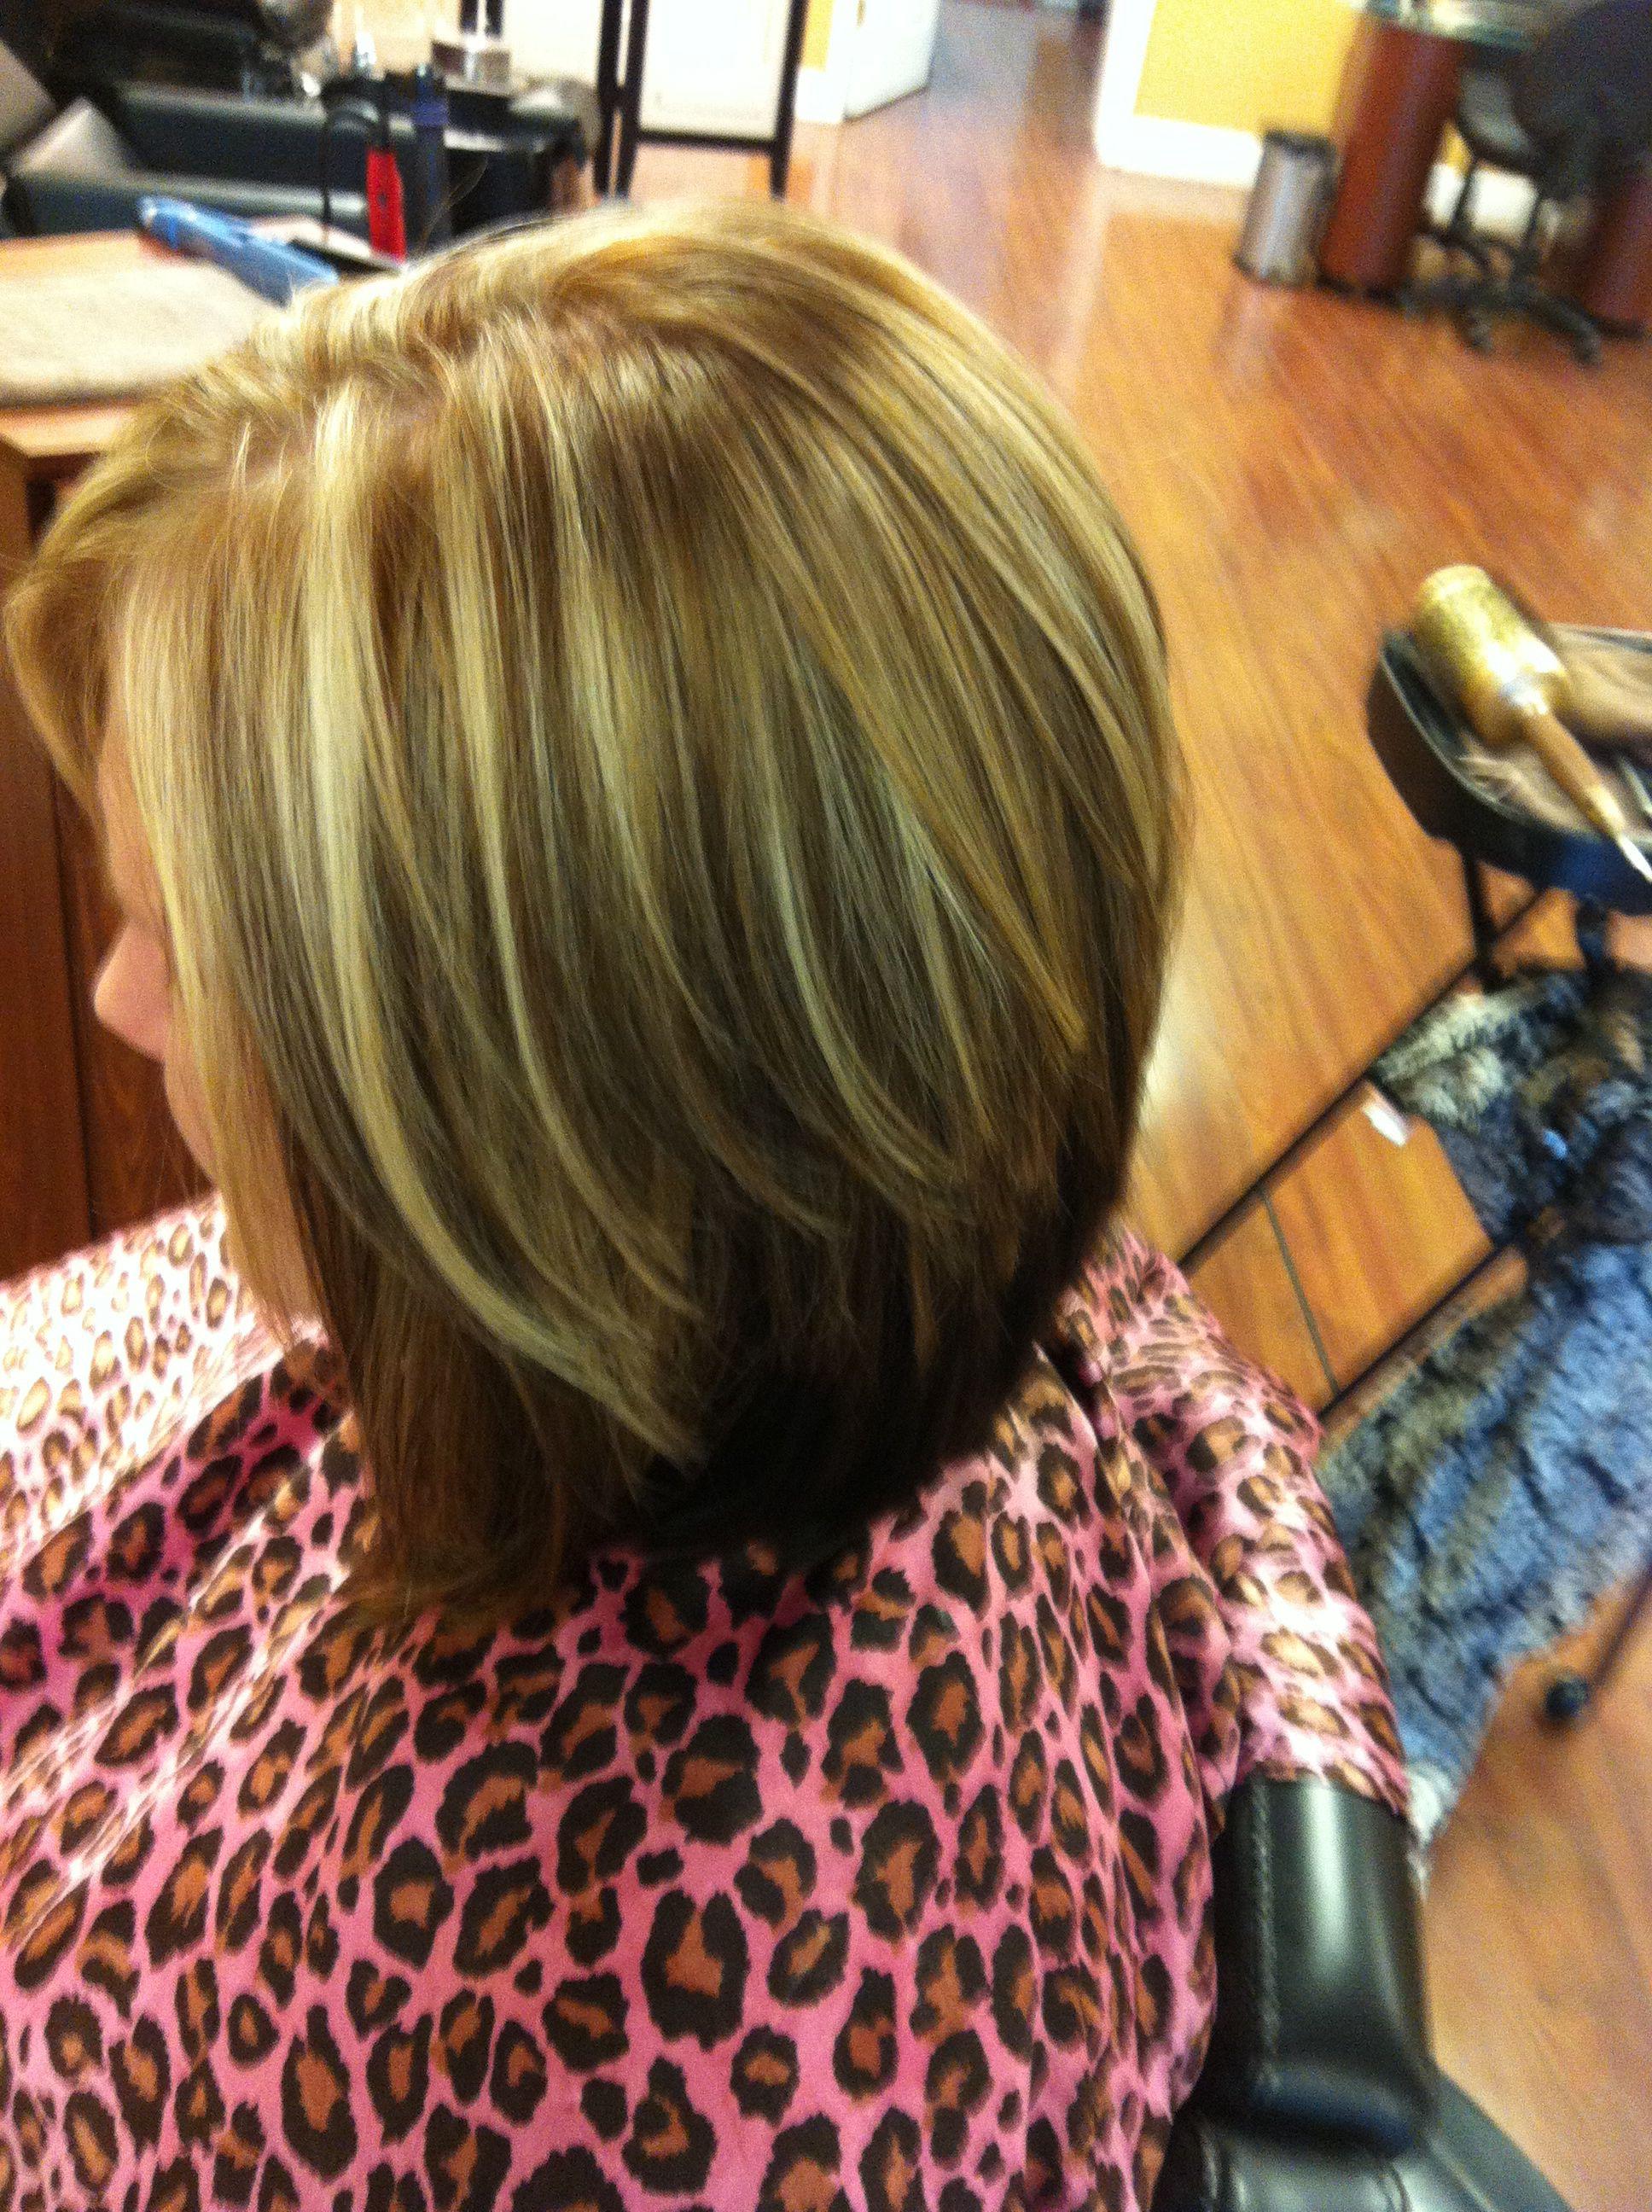 Dark brown underneath, dark blonde lowlights, bright blonde highlights: ) slightly stacked, layered bob haircut.